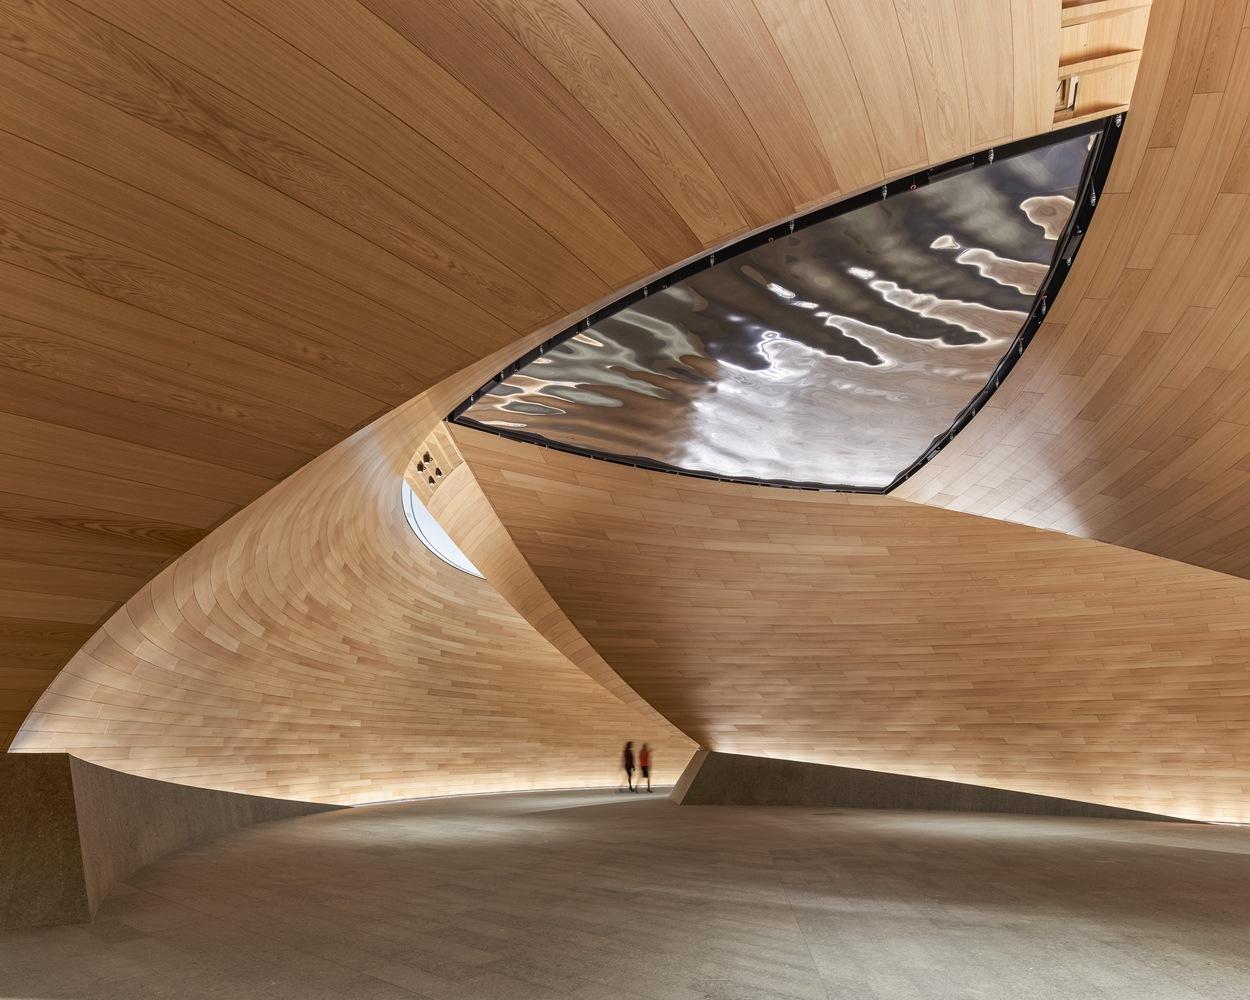 «The Vortex», το φουτουριστικό σχέδιο των Foster + Partners, για την ευρωπαϊκή έδρα των επιχειρήσεων Bloomberg, στο Λονδίνο